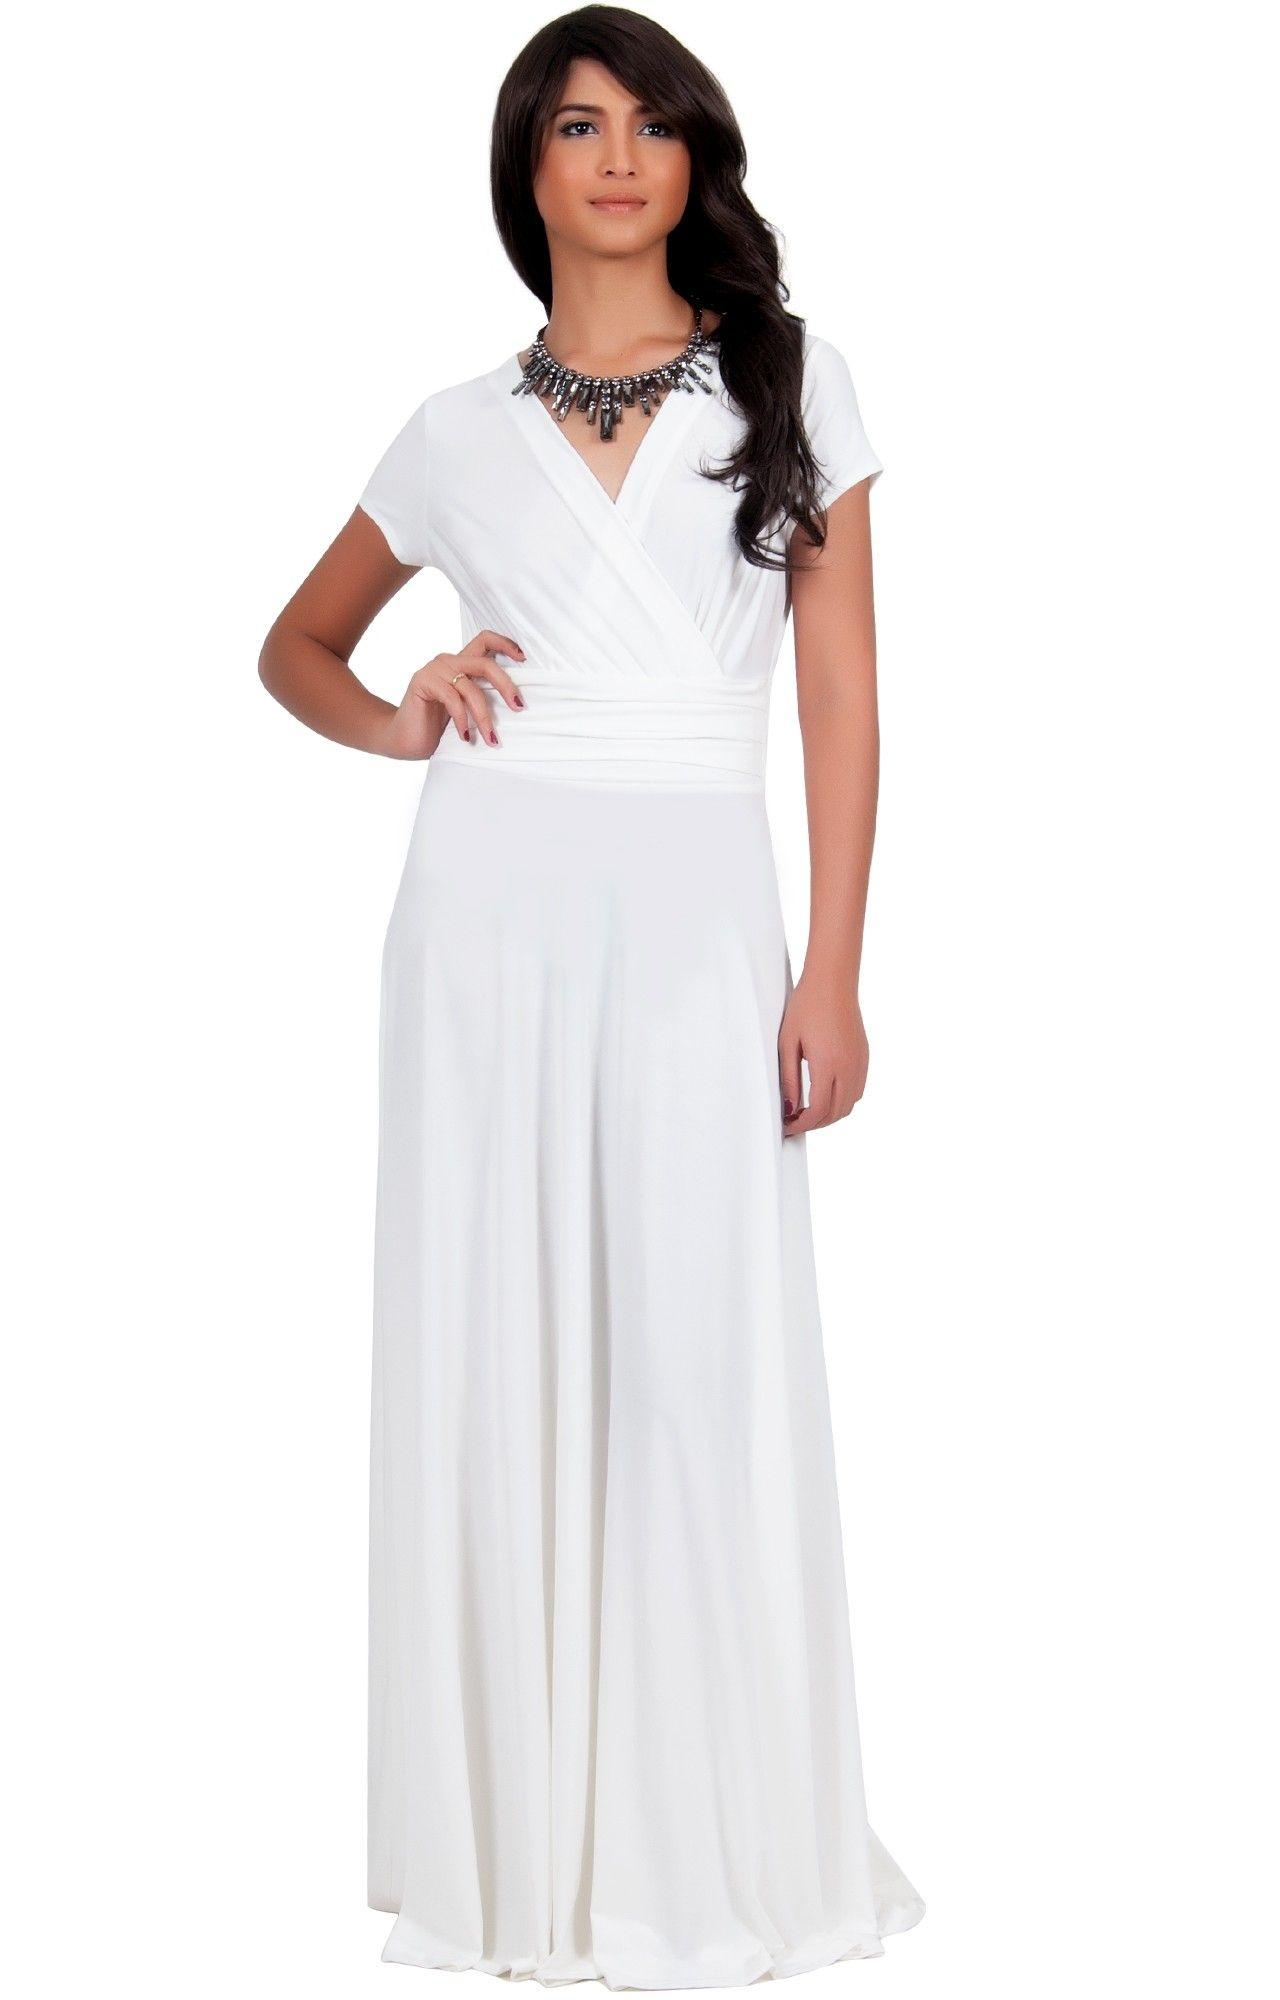 Image result for maxi dress cap sleeve branding photoshoot